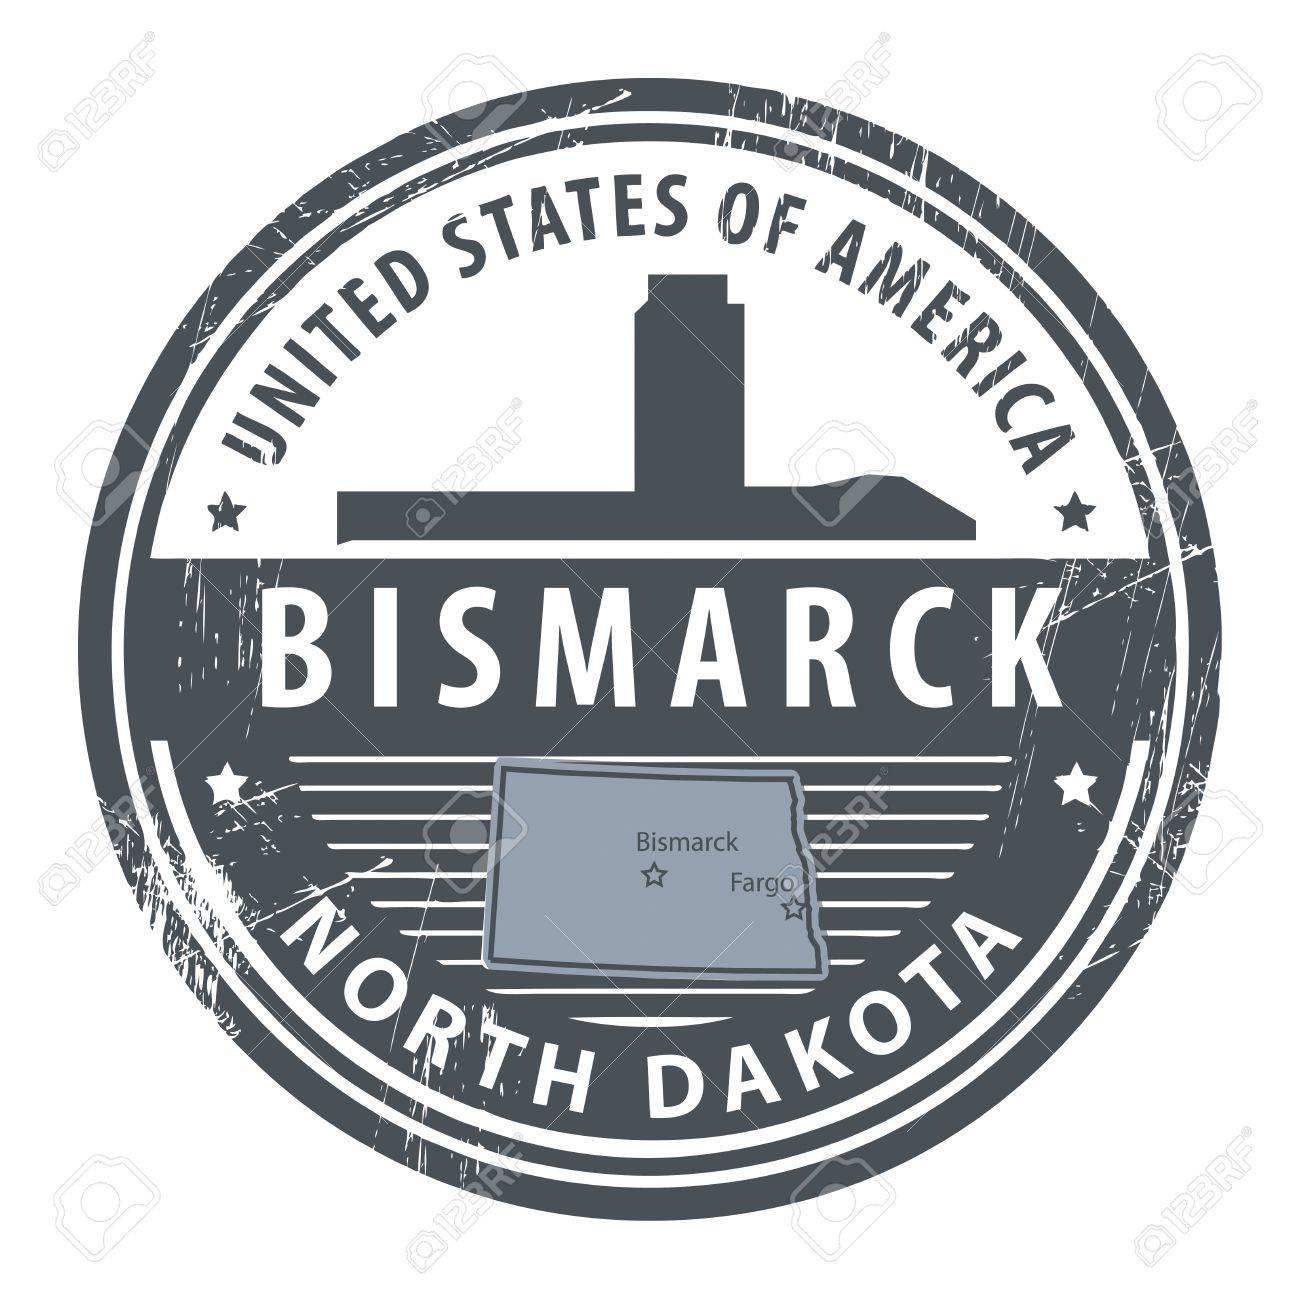 Grunge Rubber Stamp With Name Of North Dakota Bismarck Stock Vector